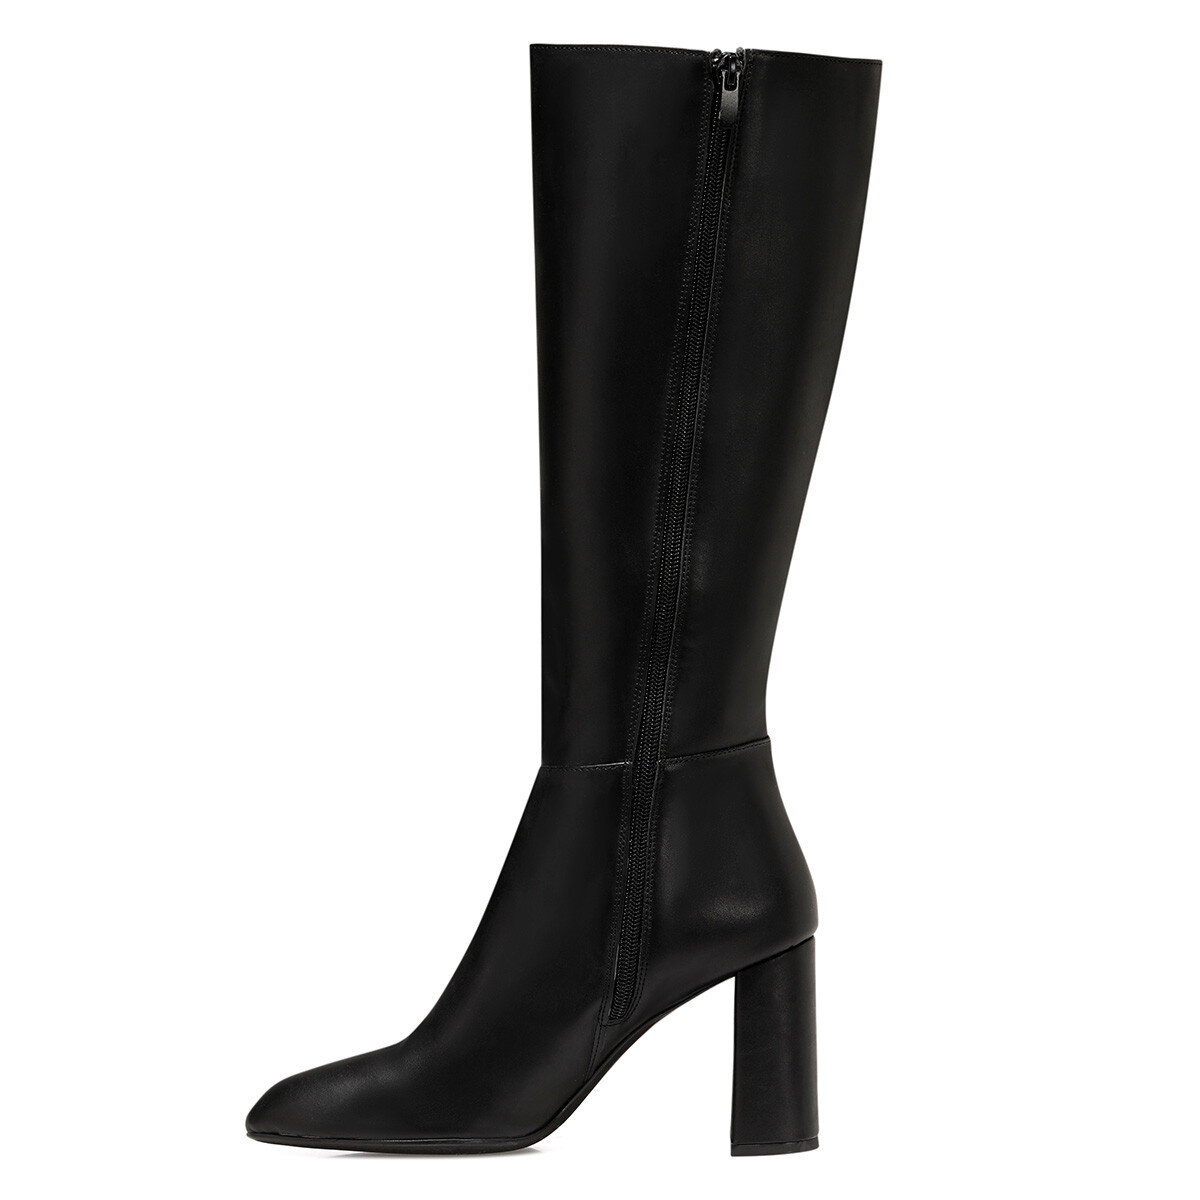 MARIMBU Siyah Kadın Topuklu Çizme